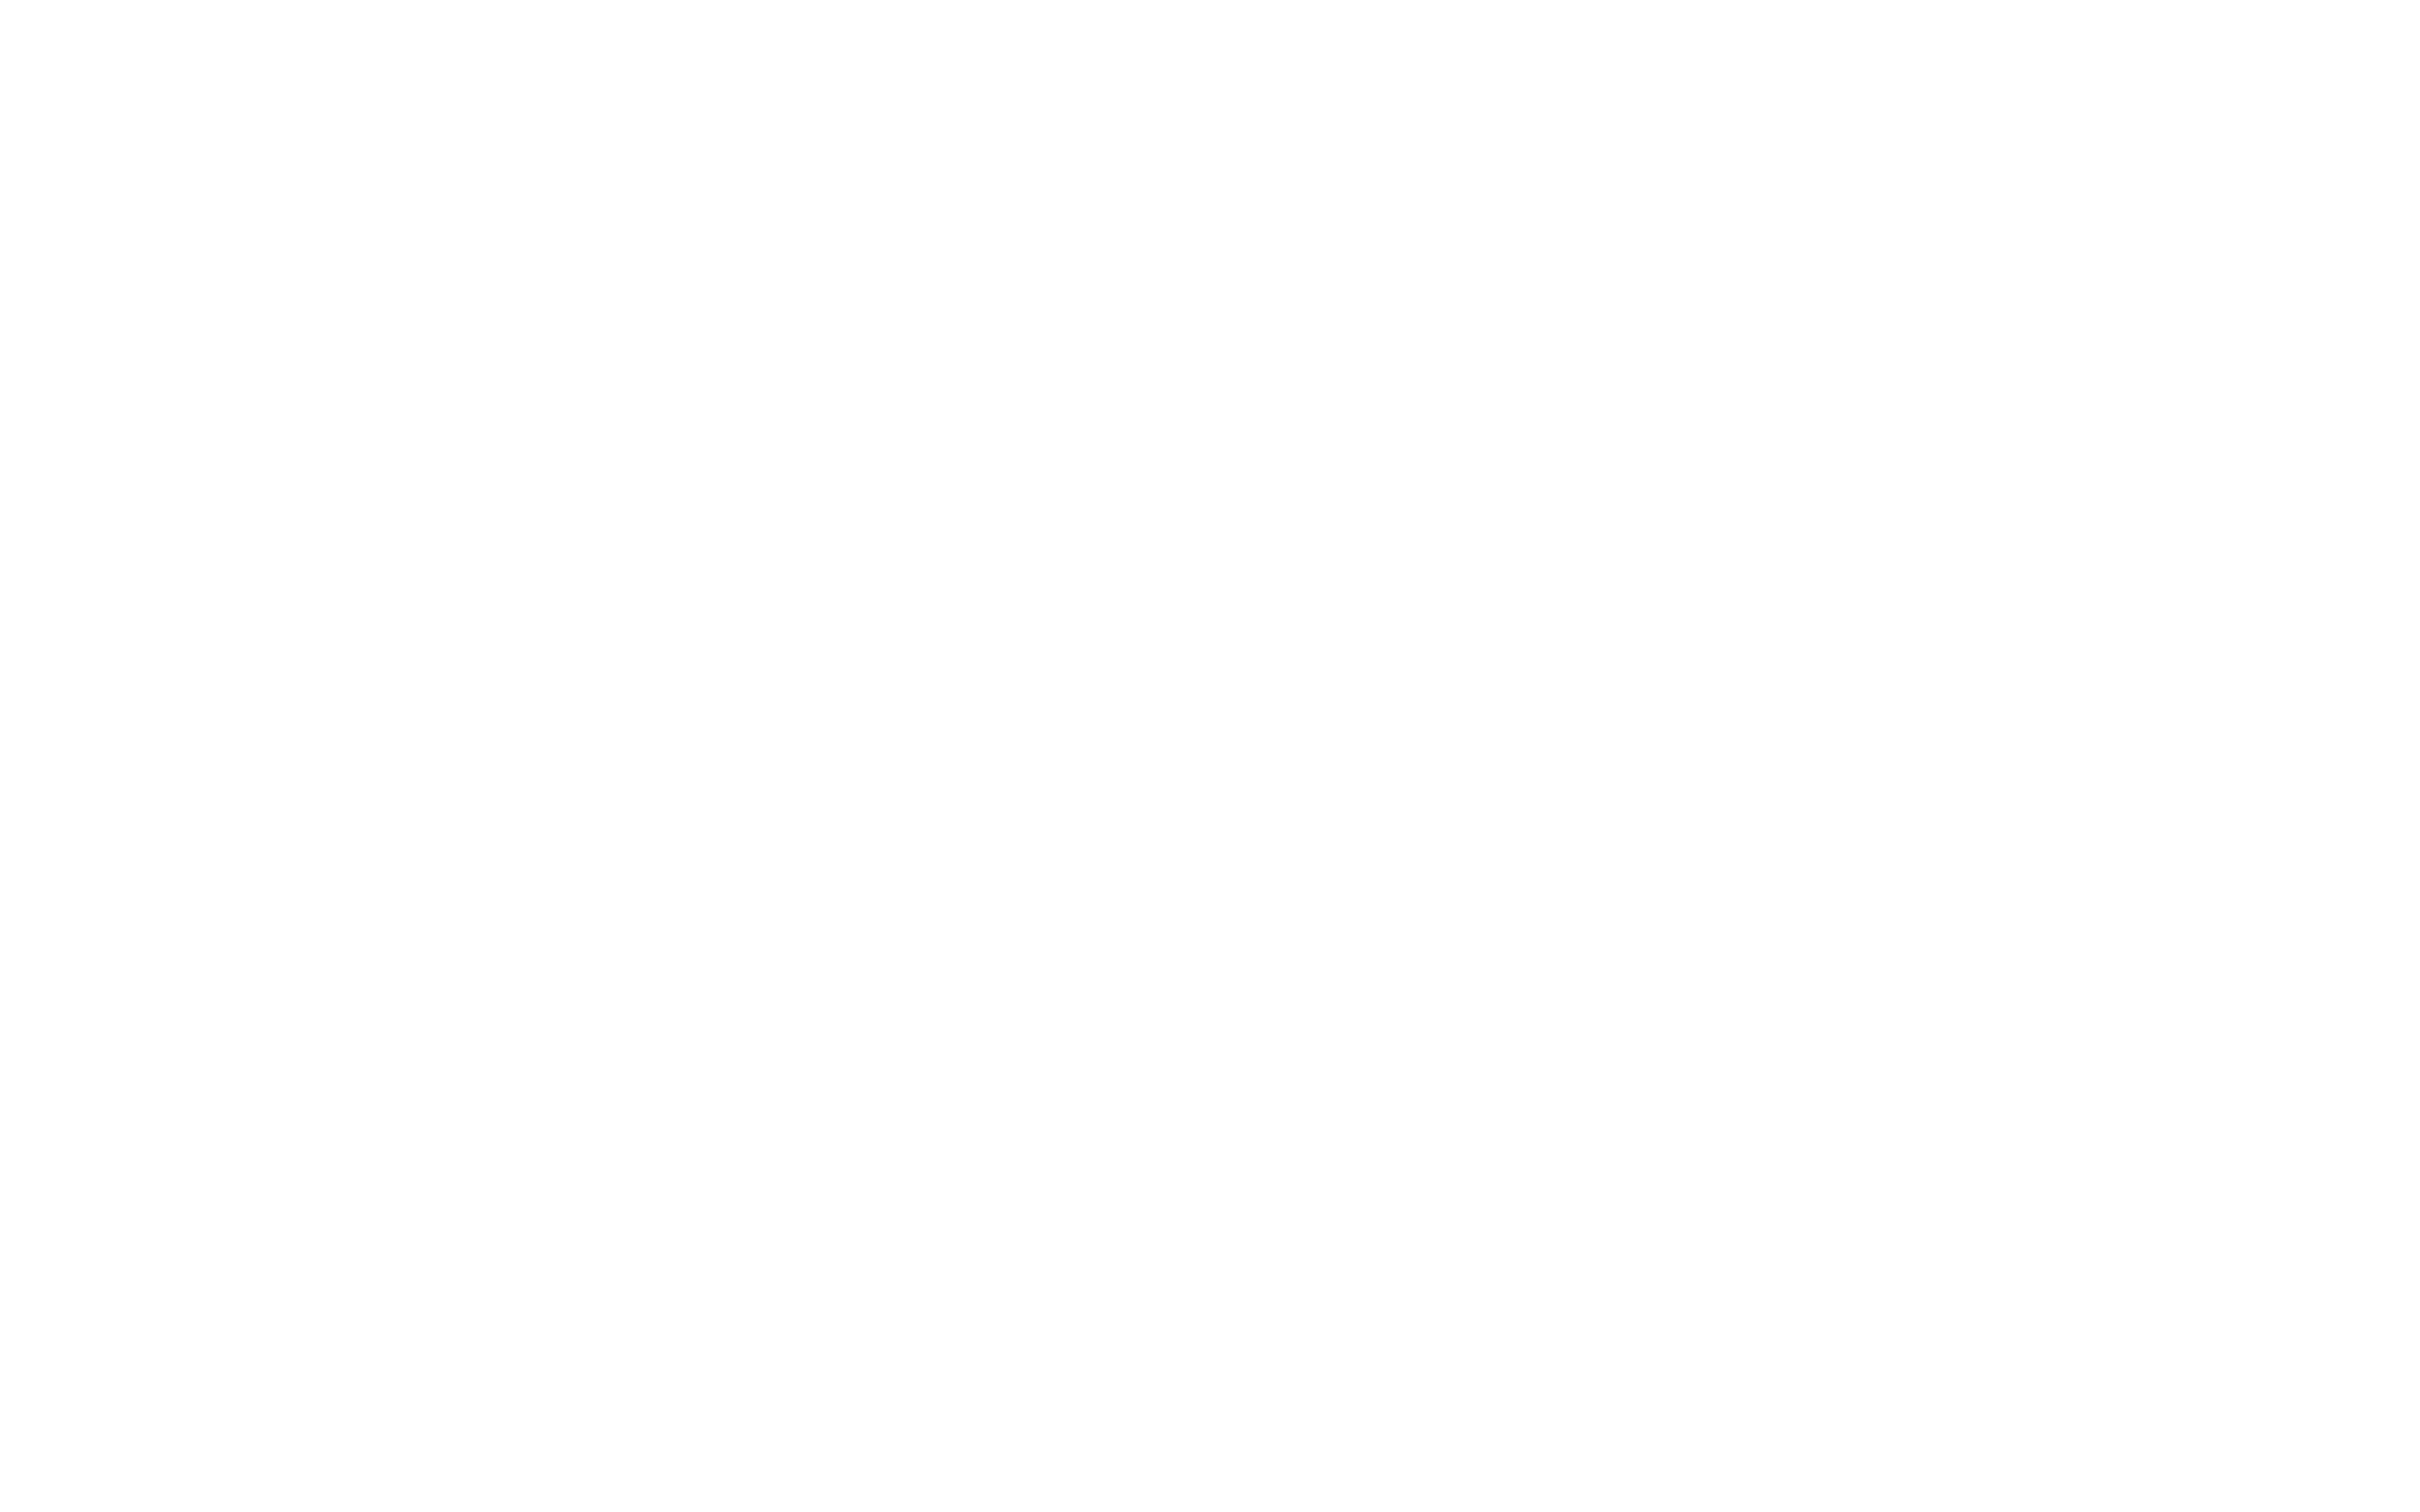 Reel – 2008